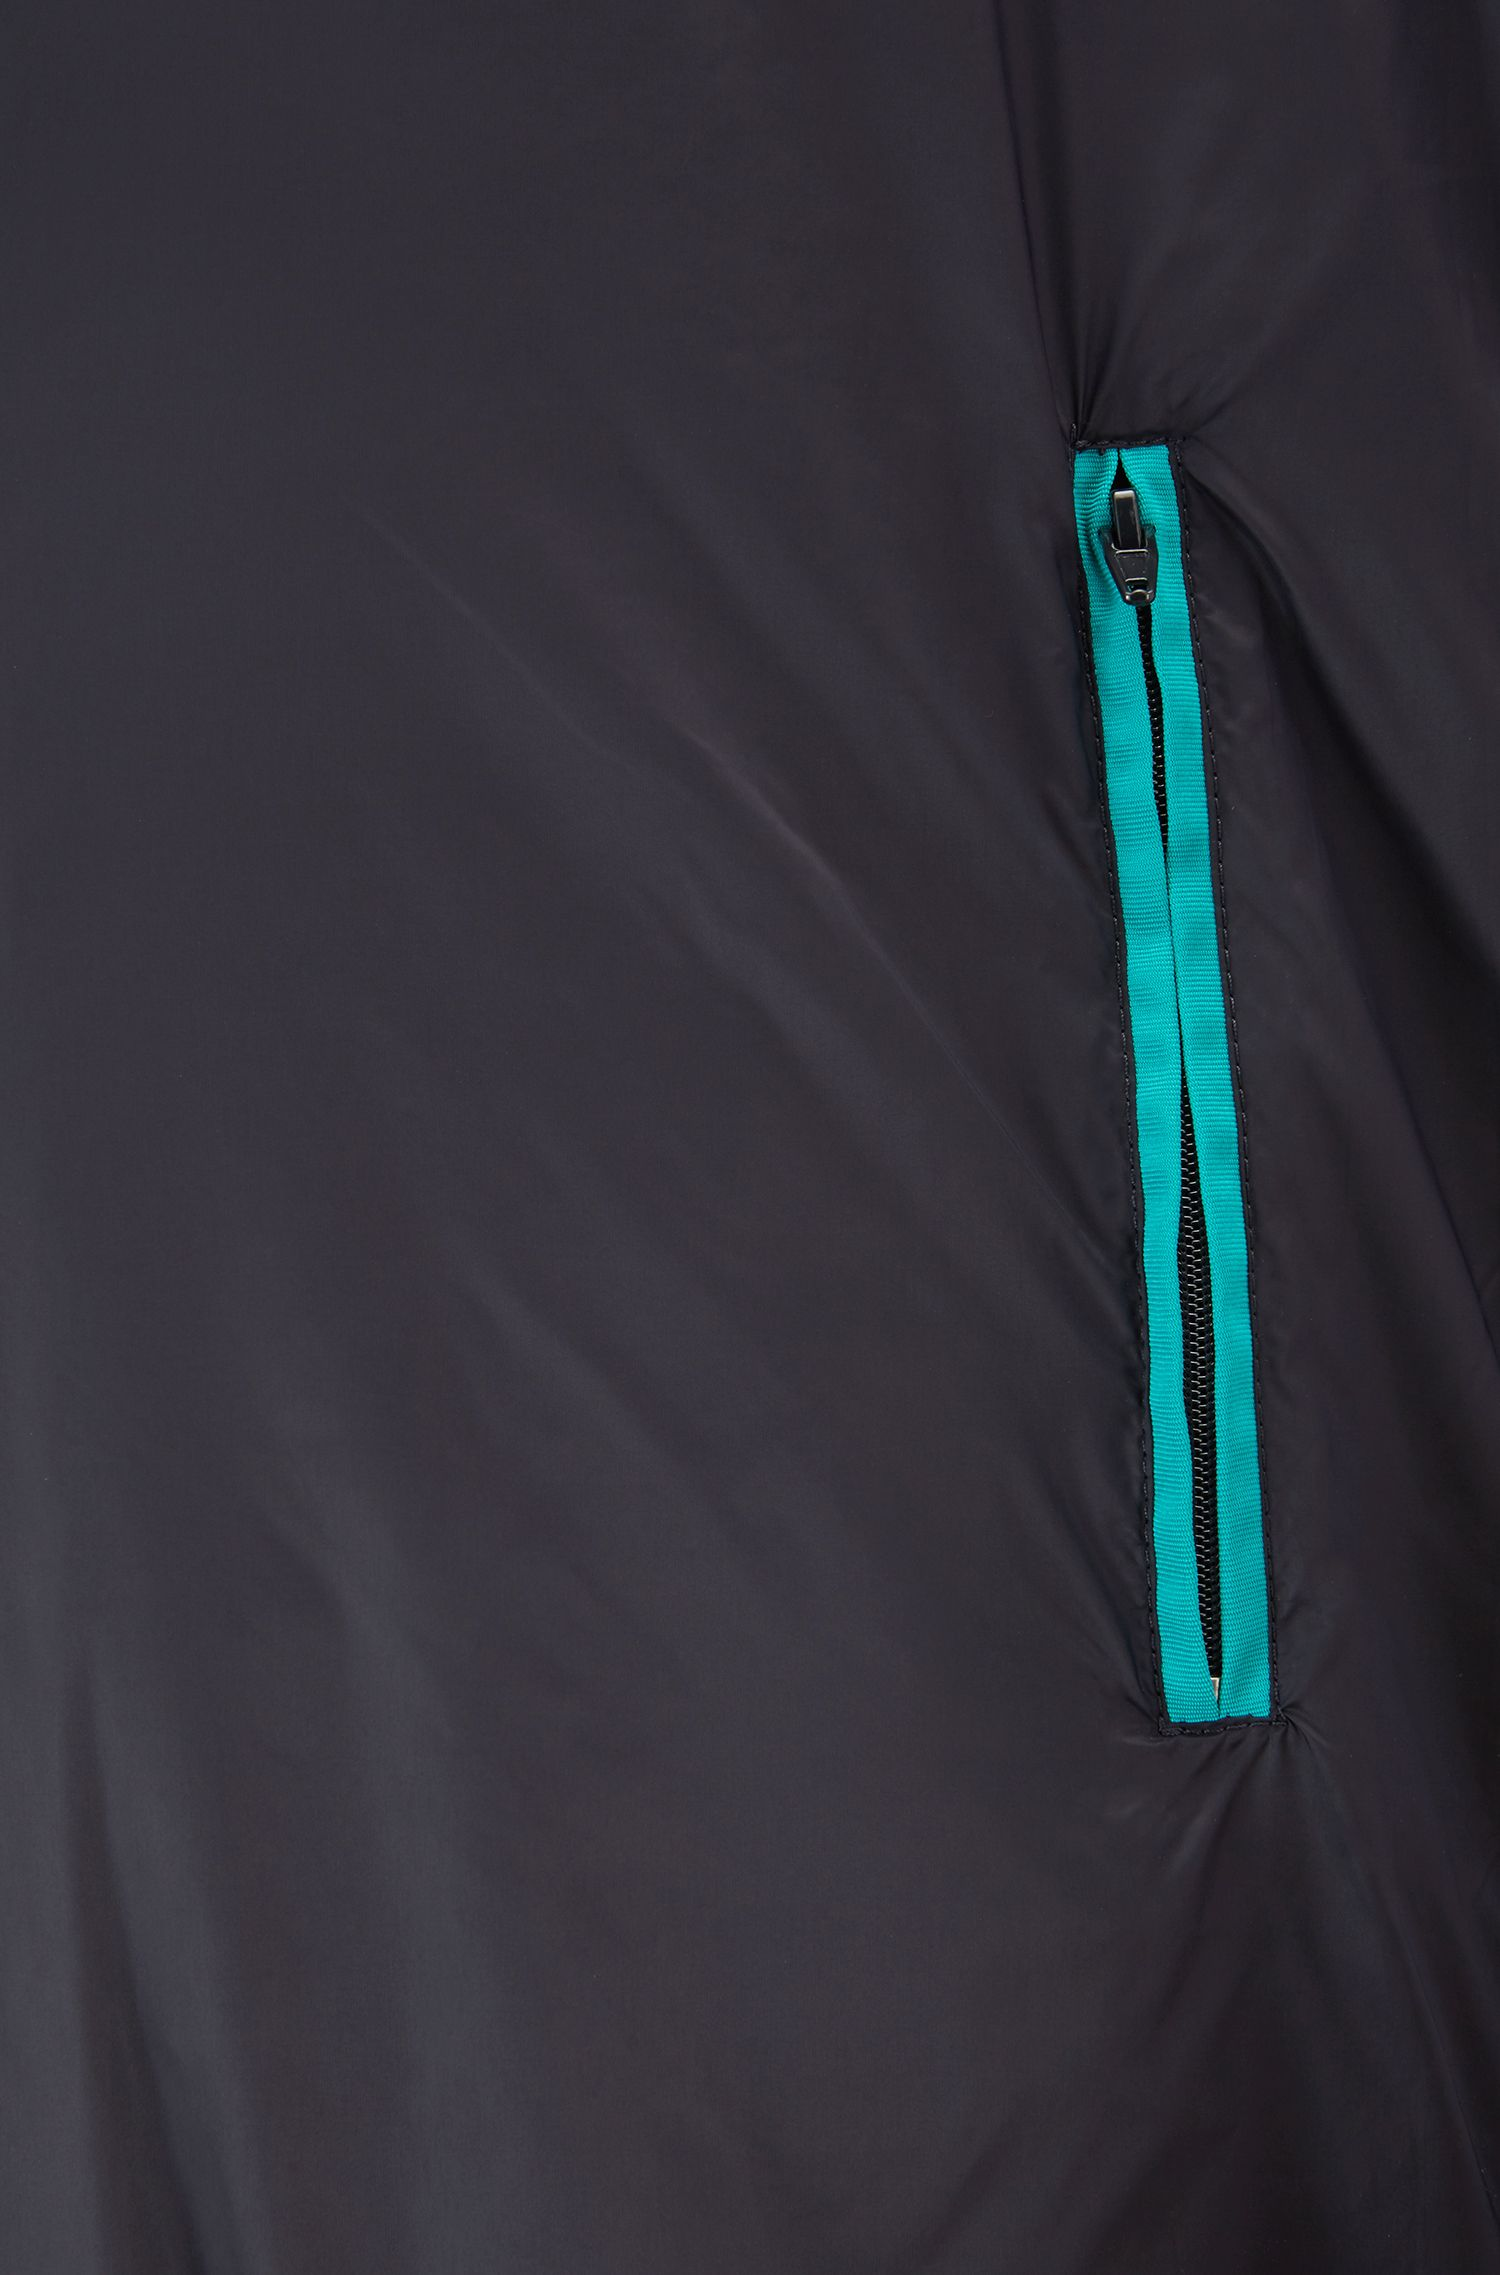 Blouson léger en tissu matelassé imperméable, Bleu